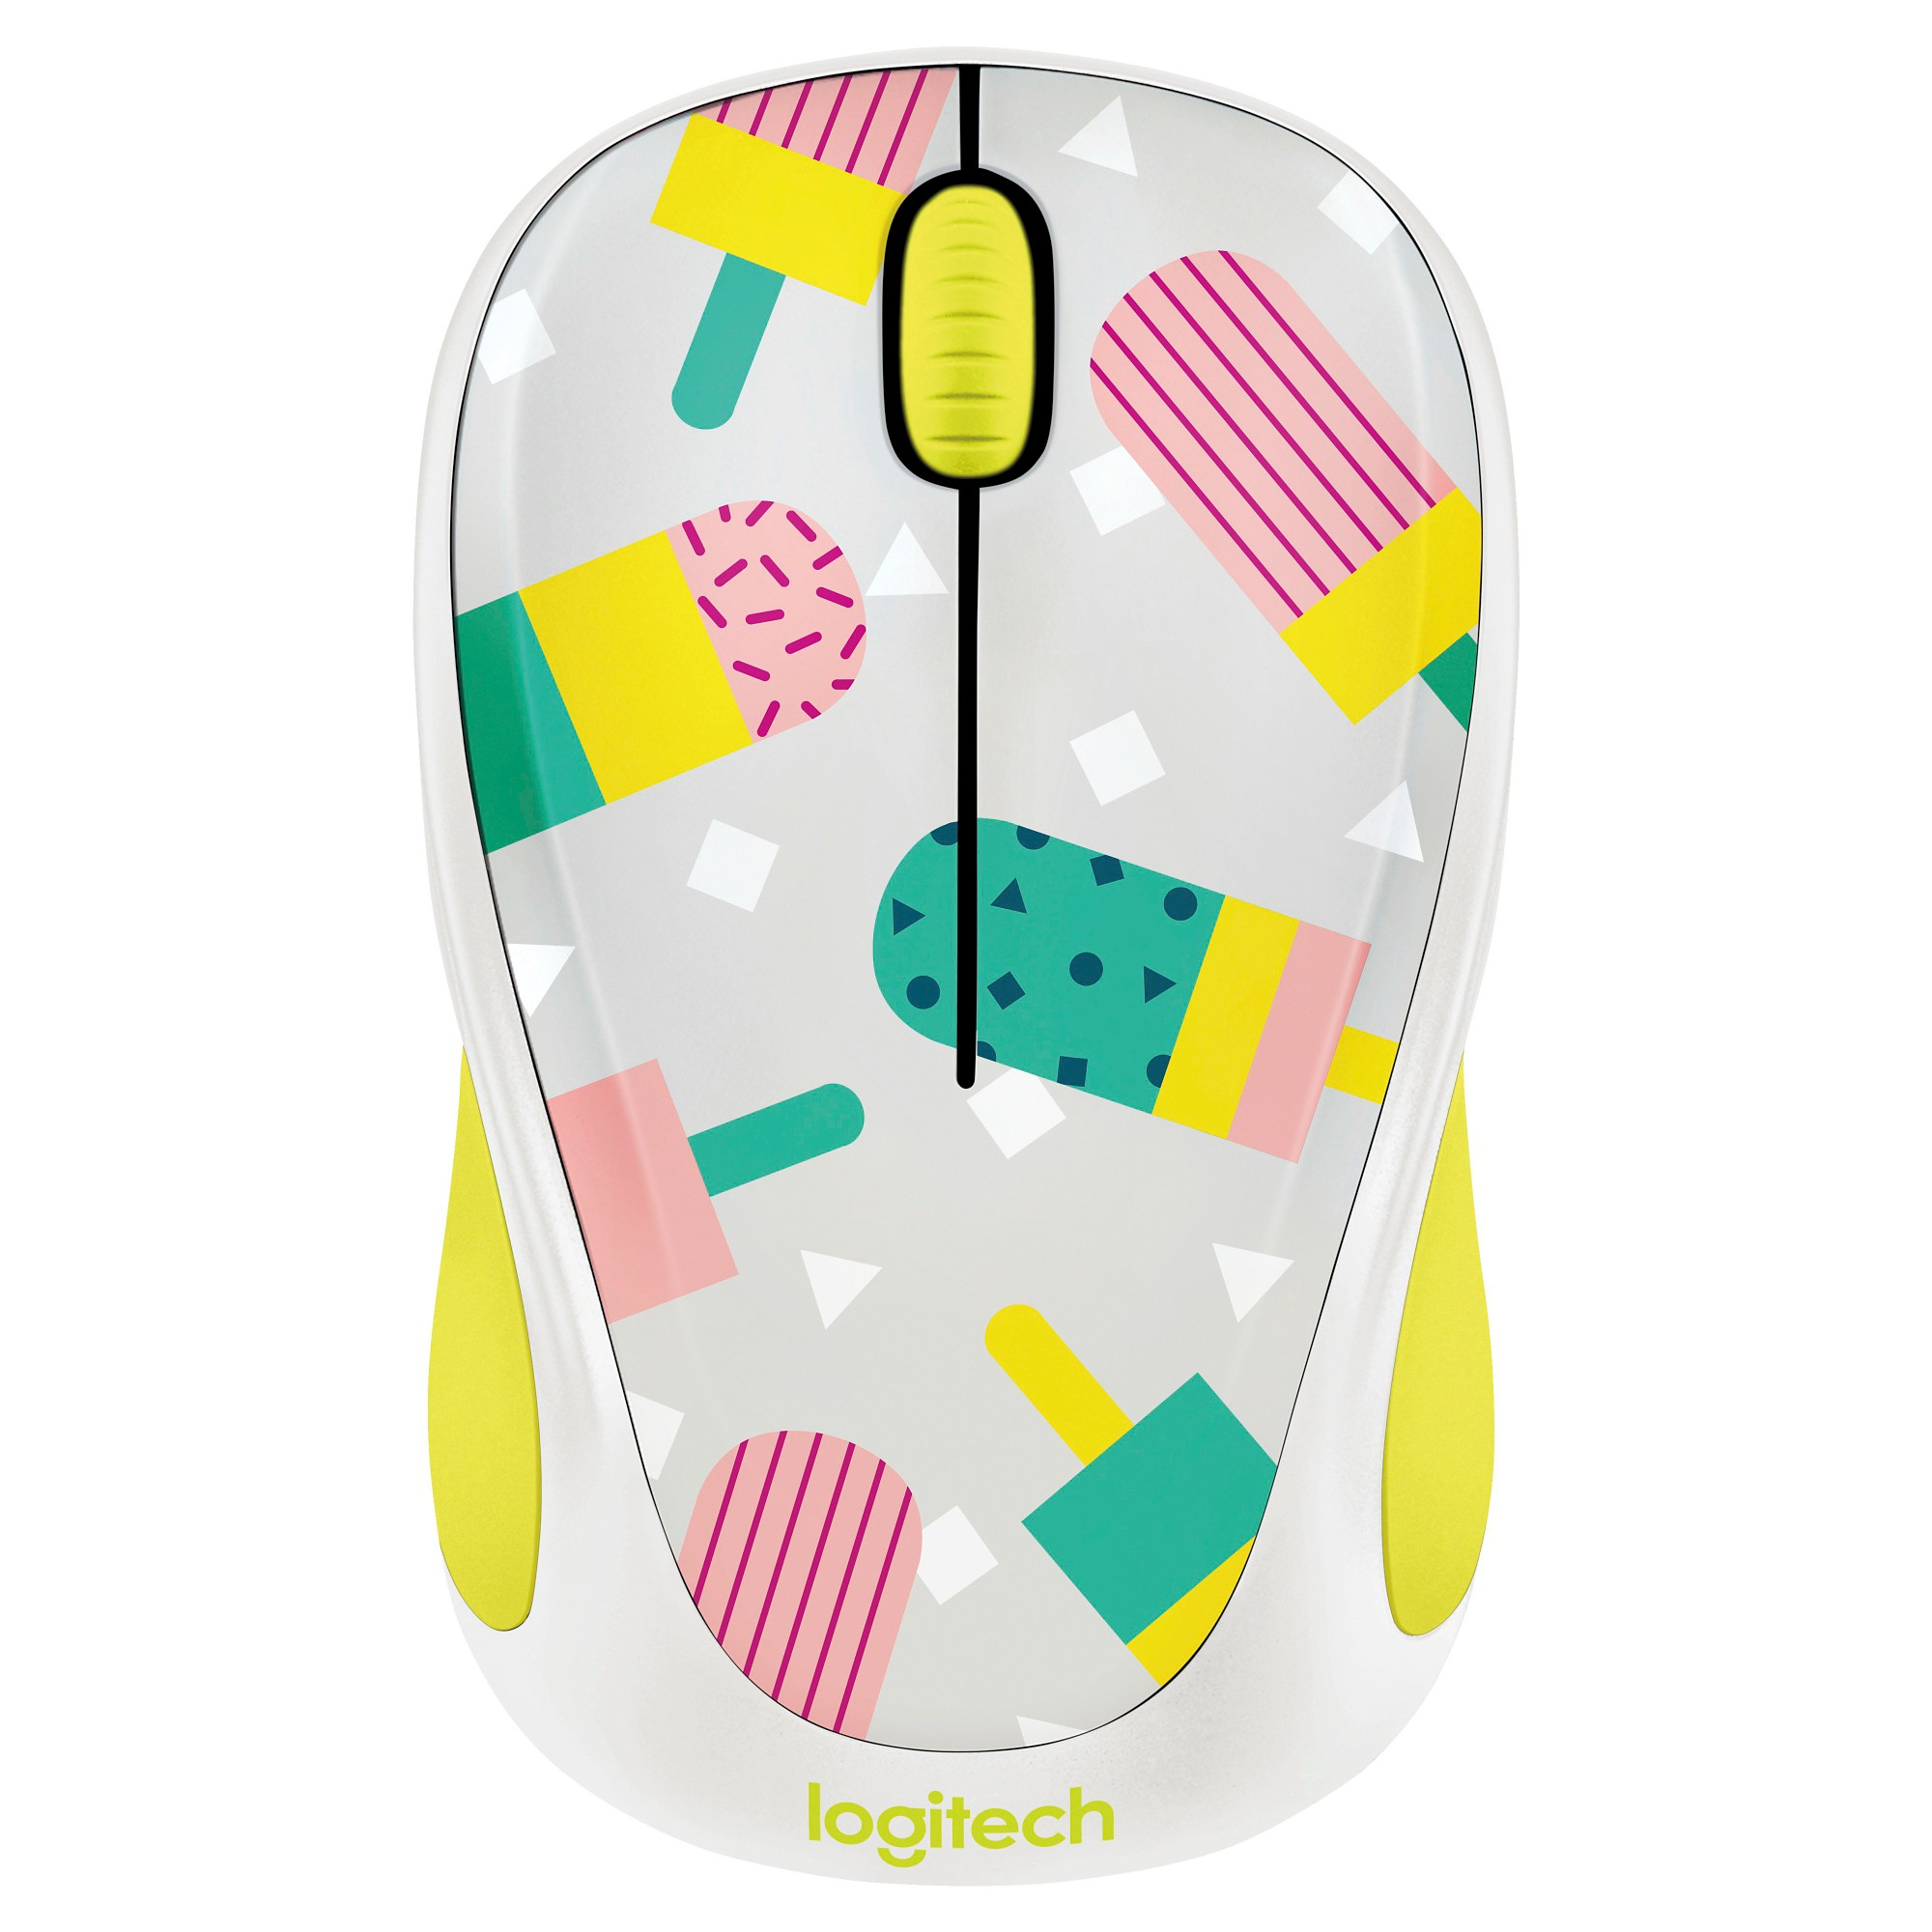 5e94551e49d Logitech M317 Wireless Popsicles Mouse - Black (910-004693 ...